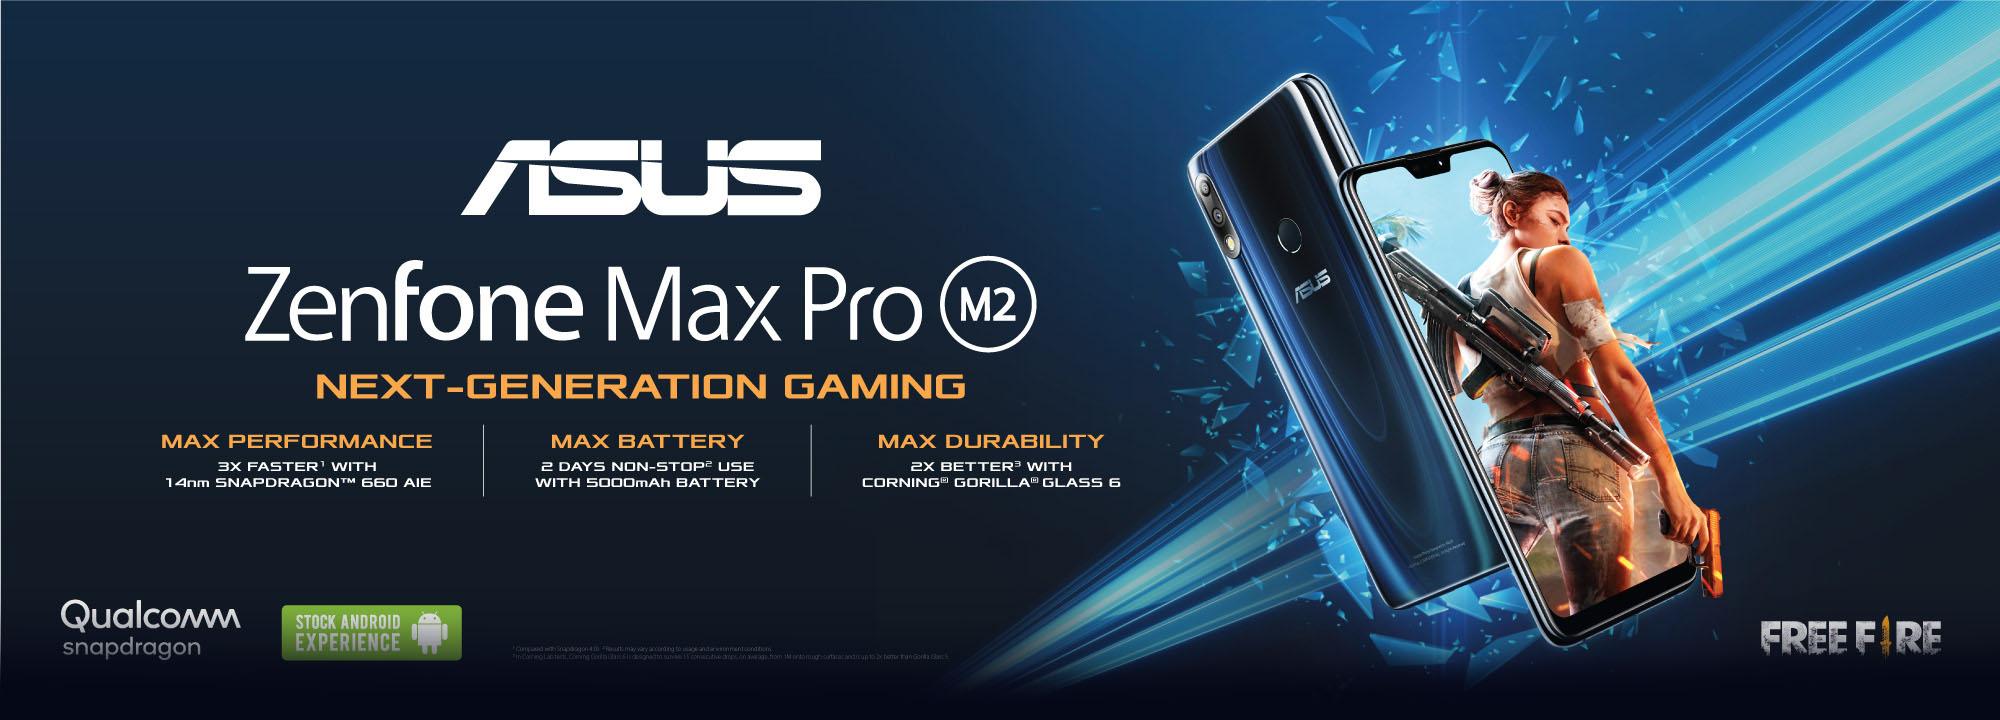 ZenFone Max Pro (M2) | Phone | ASUS Malaysia